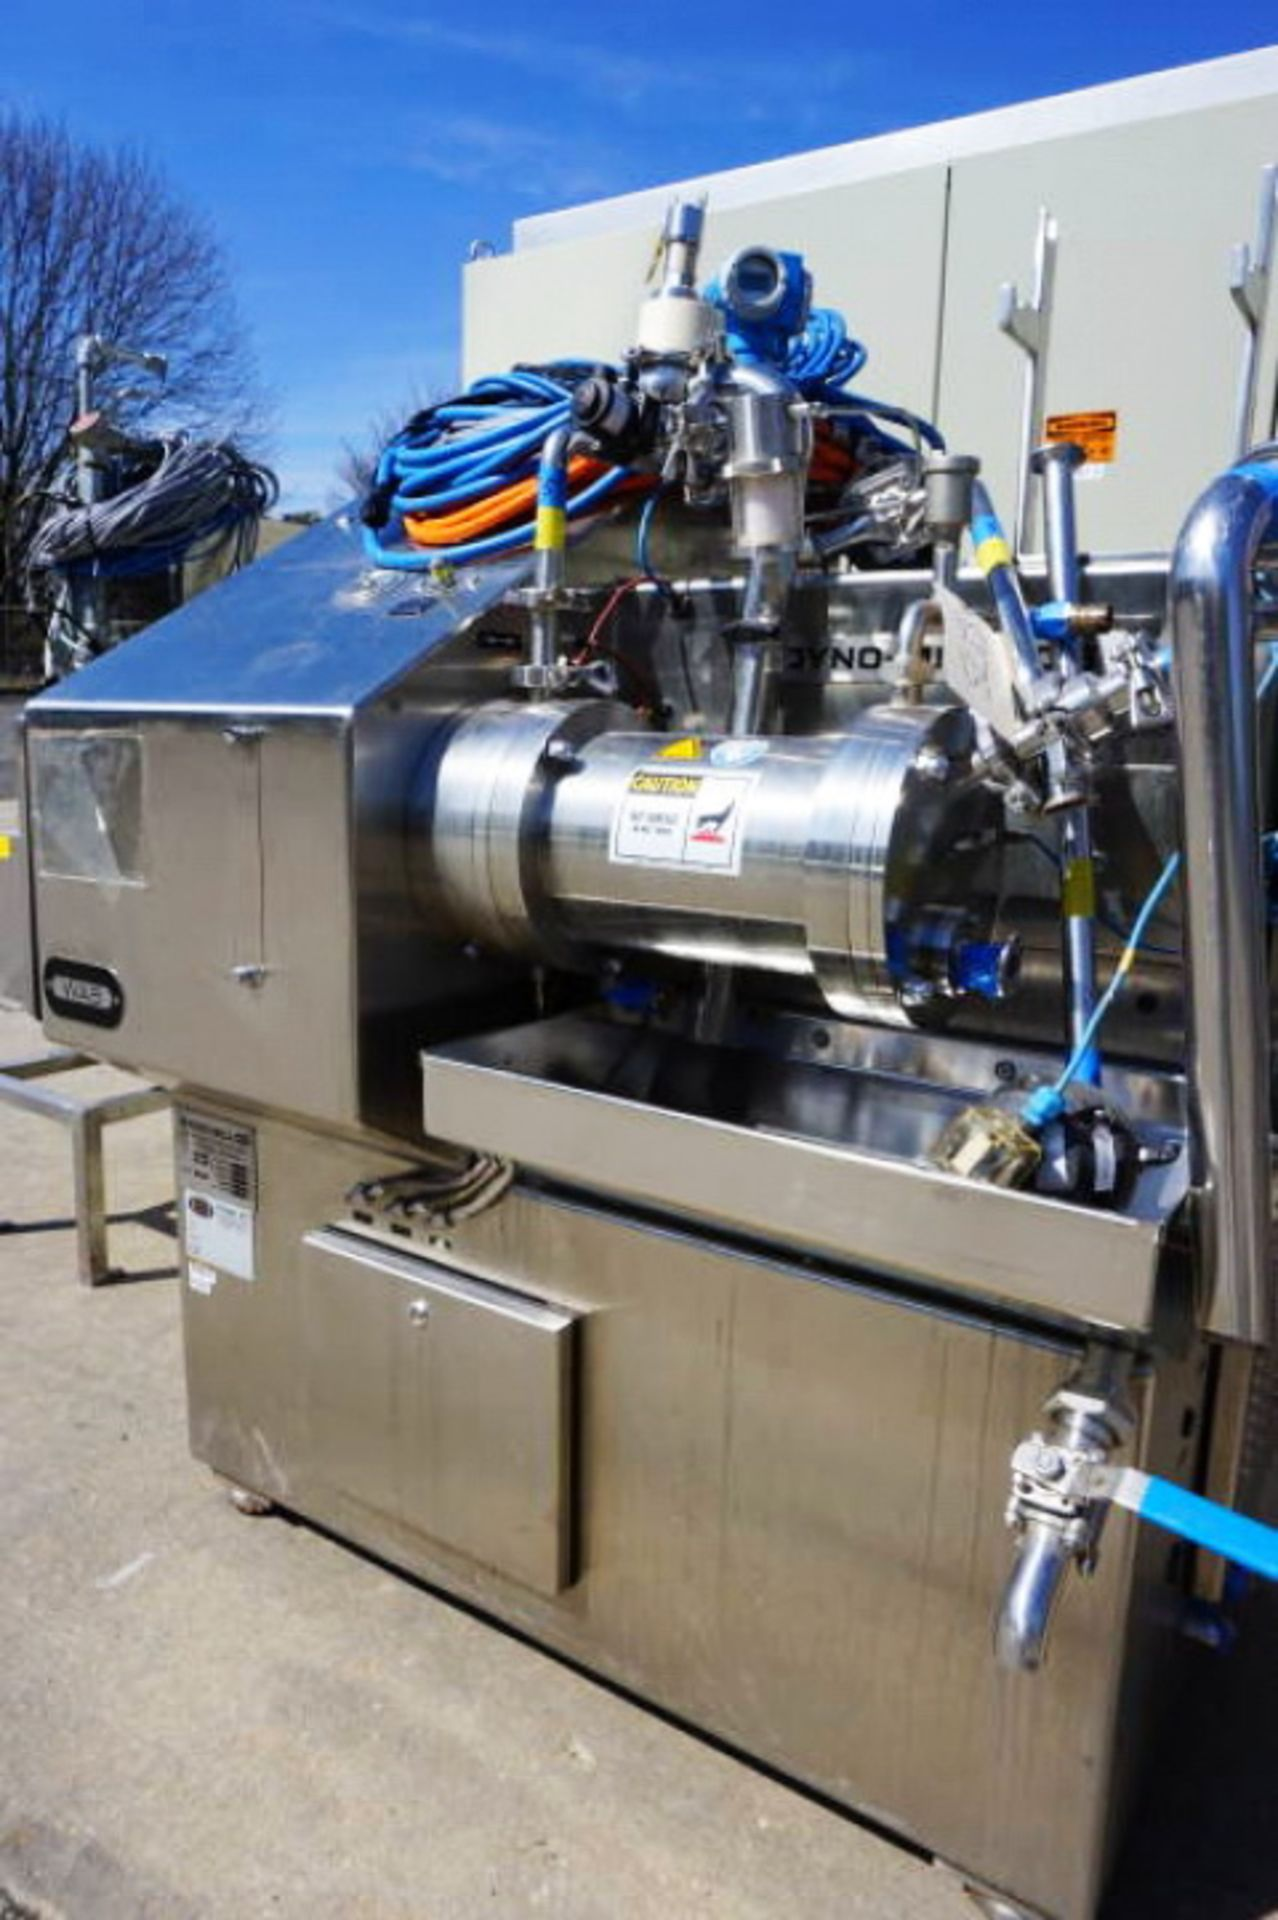 Lot 2 - Willy Bachofen (WAB) Horizontal Dyno-Mill Type KD6 Pulverizing/Media Mill, S/N 030811